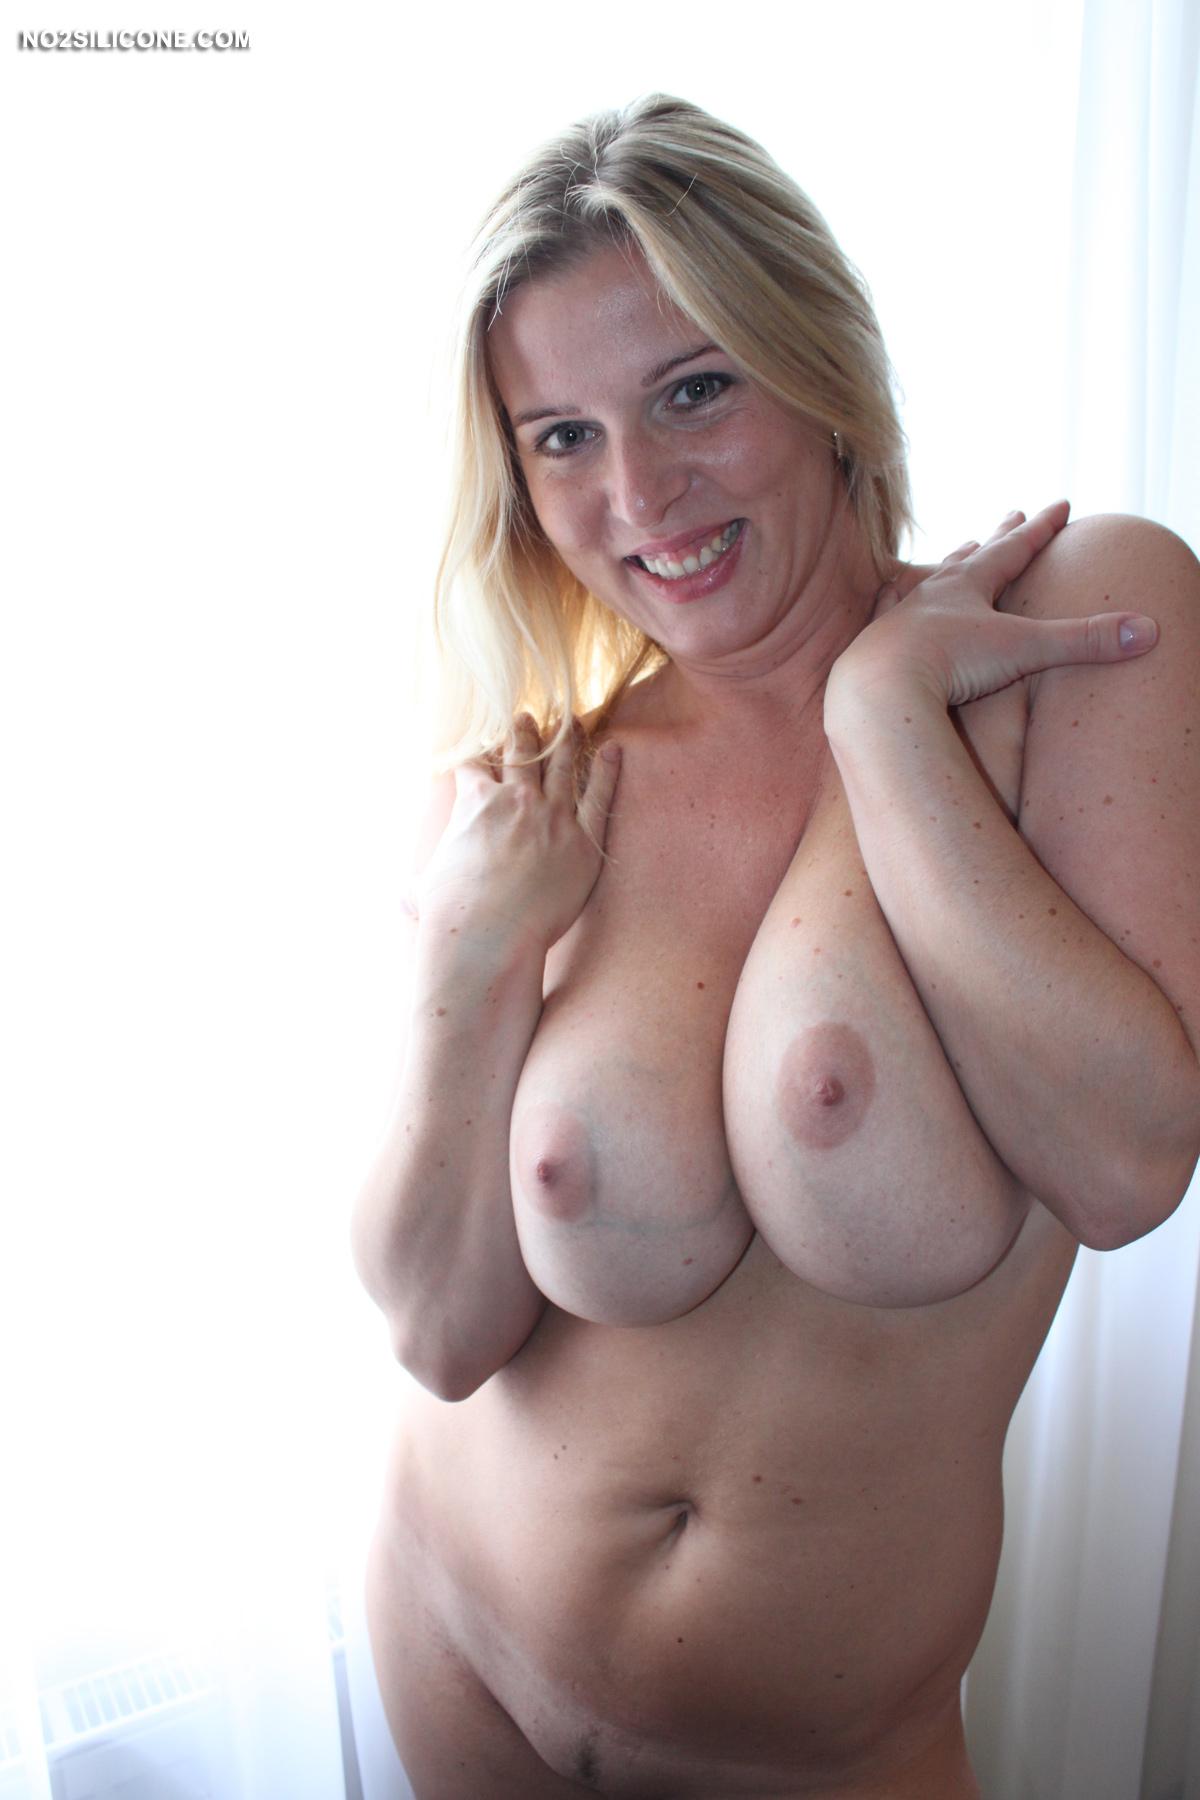 silicone boobs tumblr